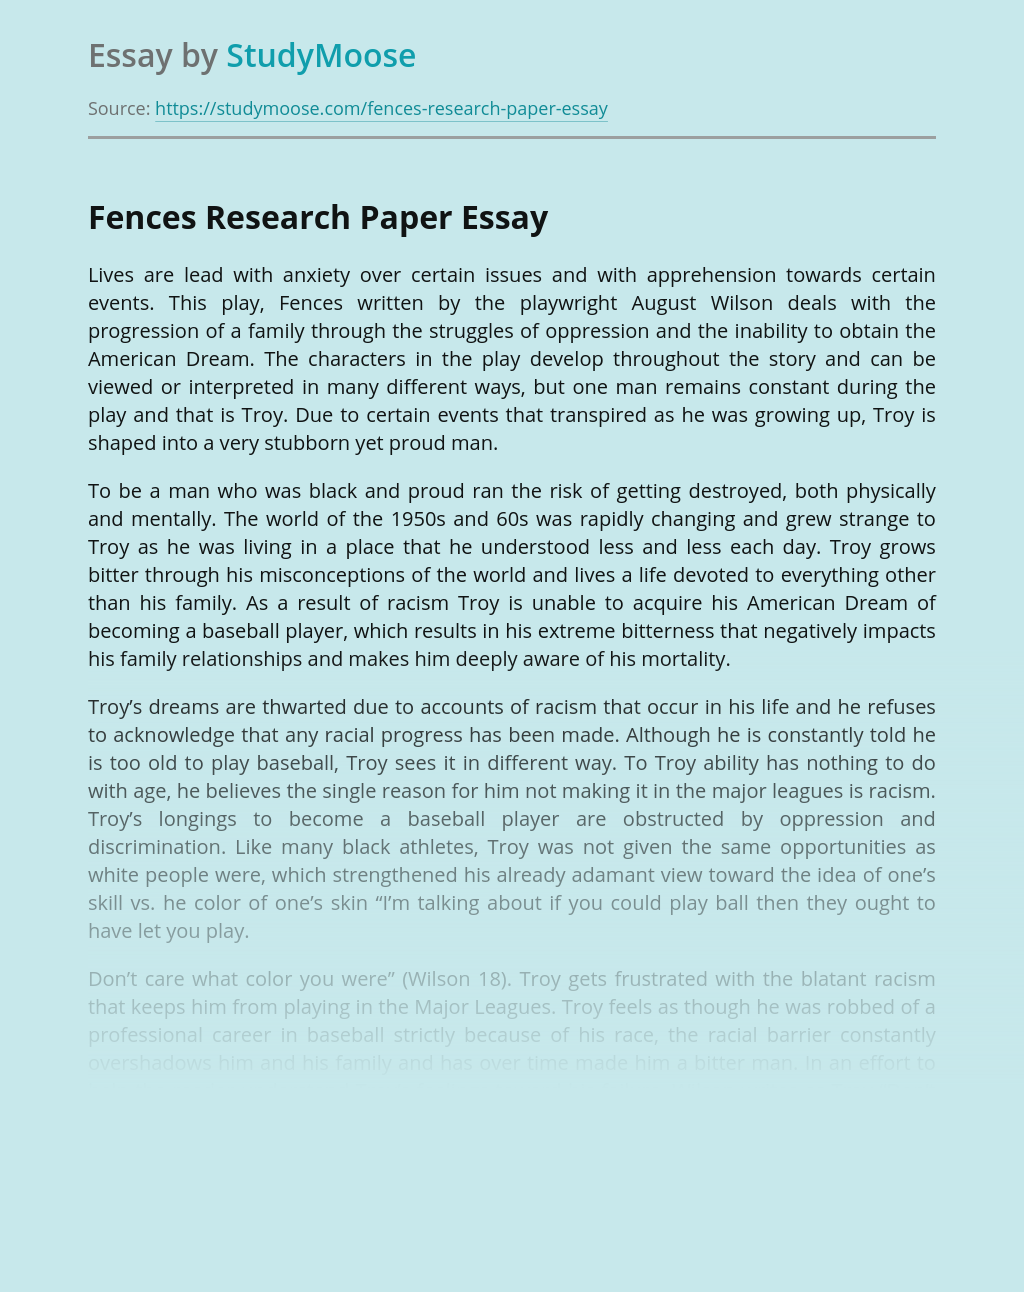 Fences Research Paper